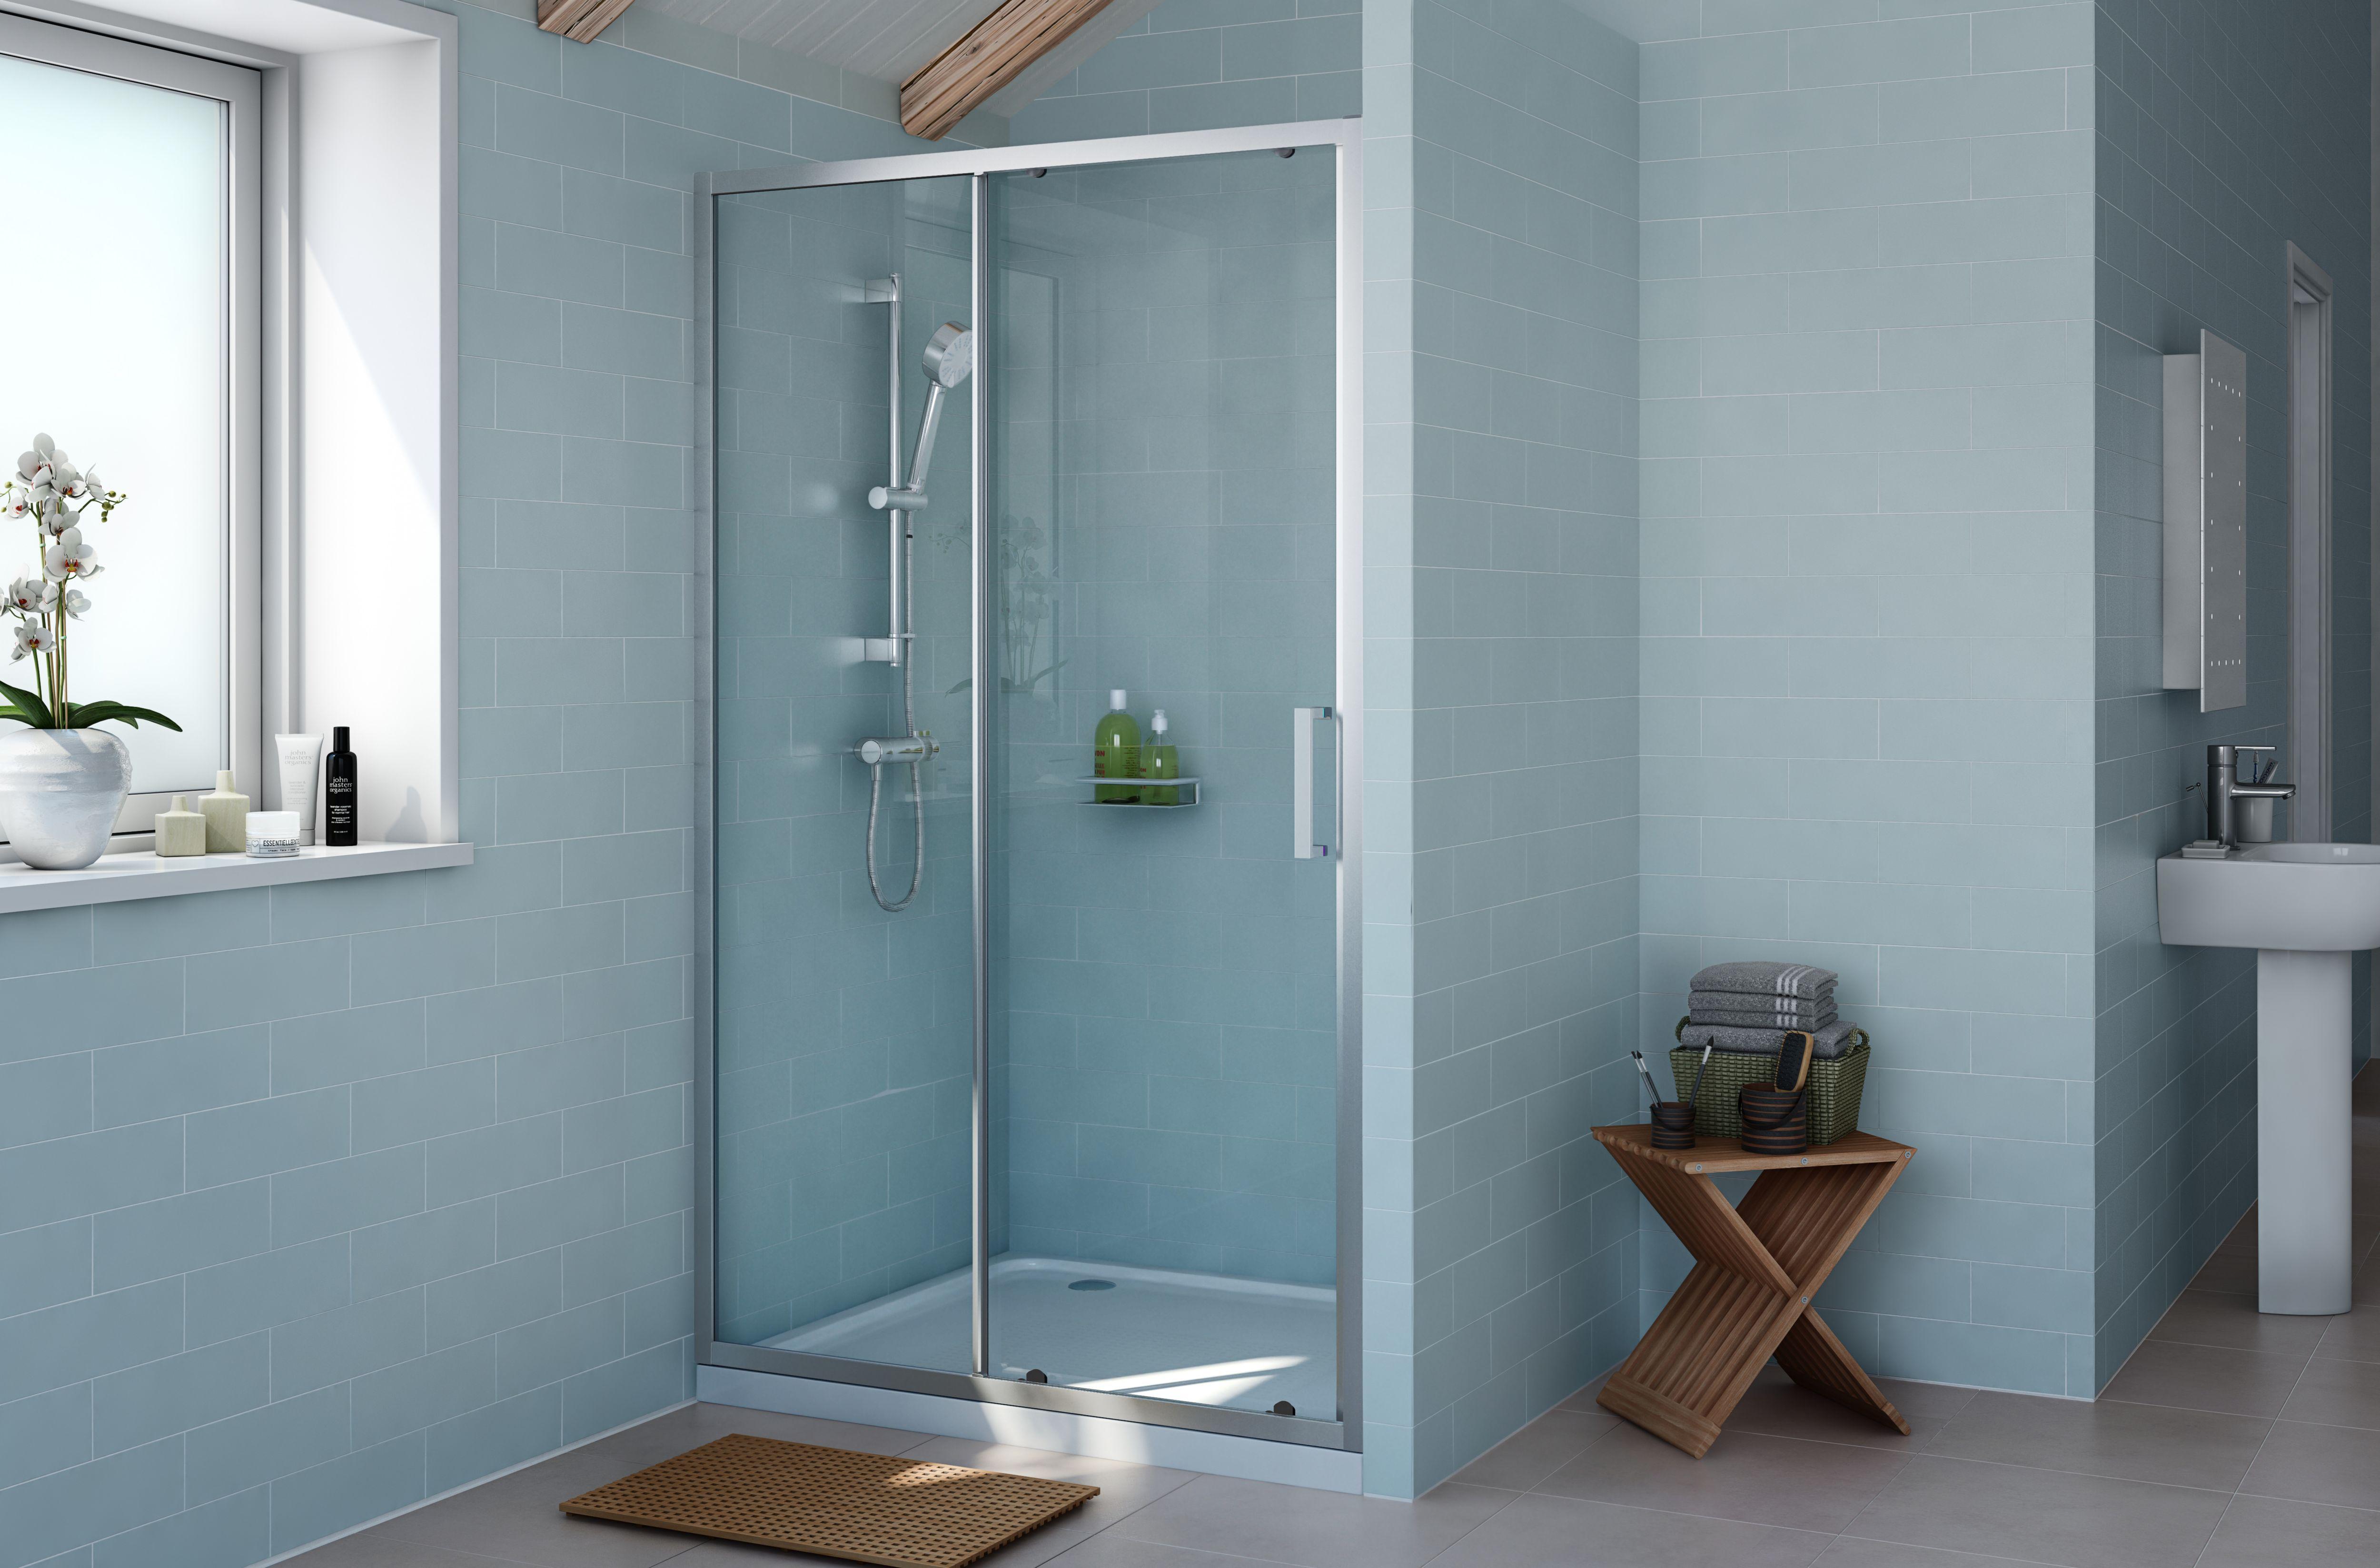 1000  ideas about Shower Enclosure on Pinterest | Shower cabin ...